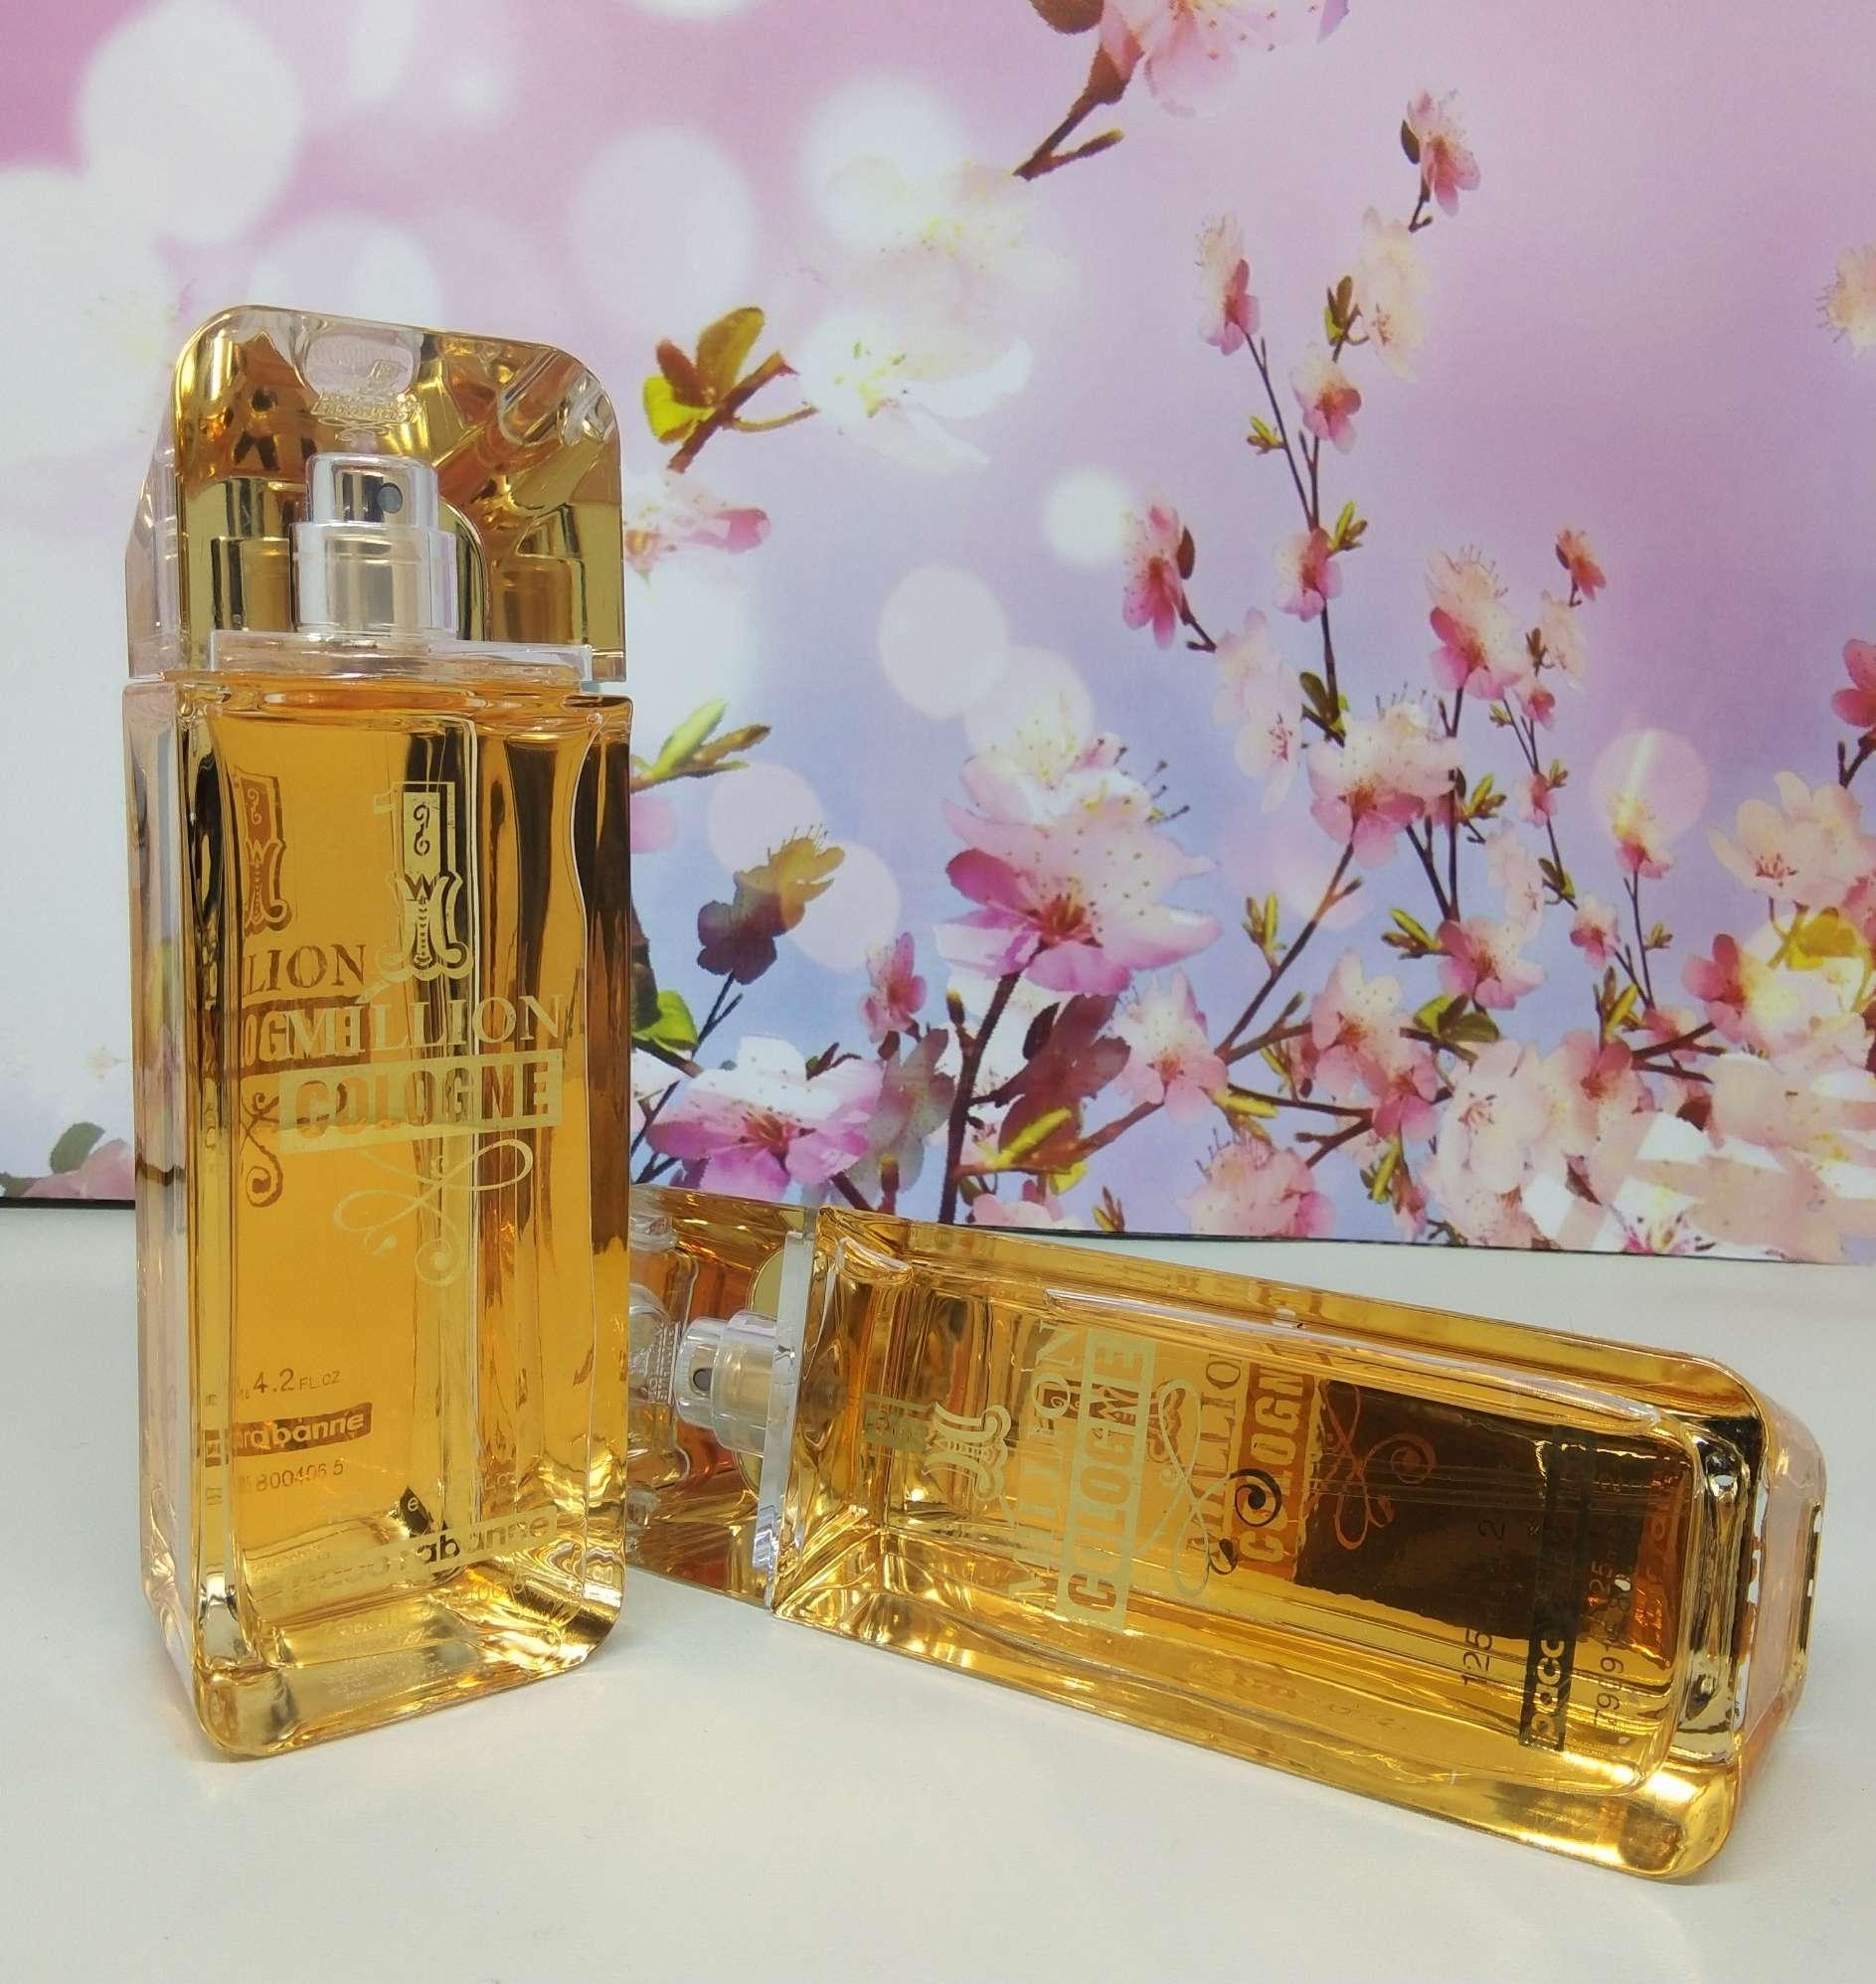 Parfum Pria Paco Rabanne One Million Cologne 125ml EDT Original Asli Eropa - Parfum Maskulin Terbaik